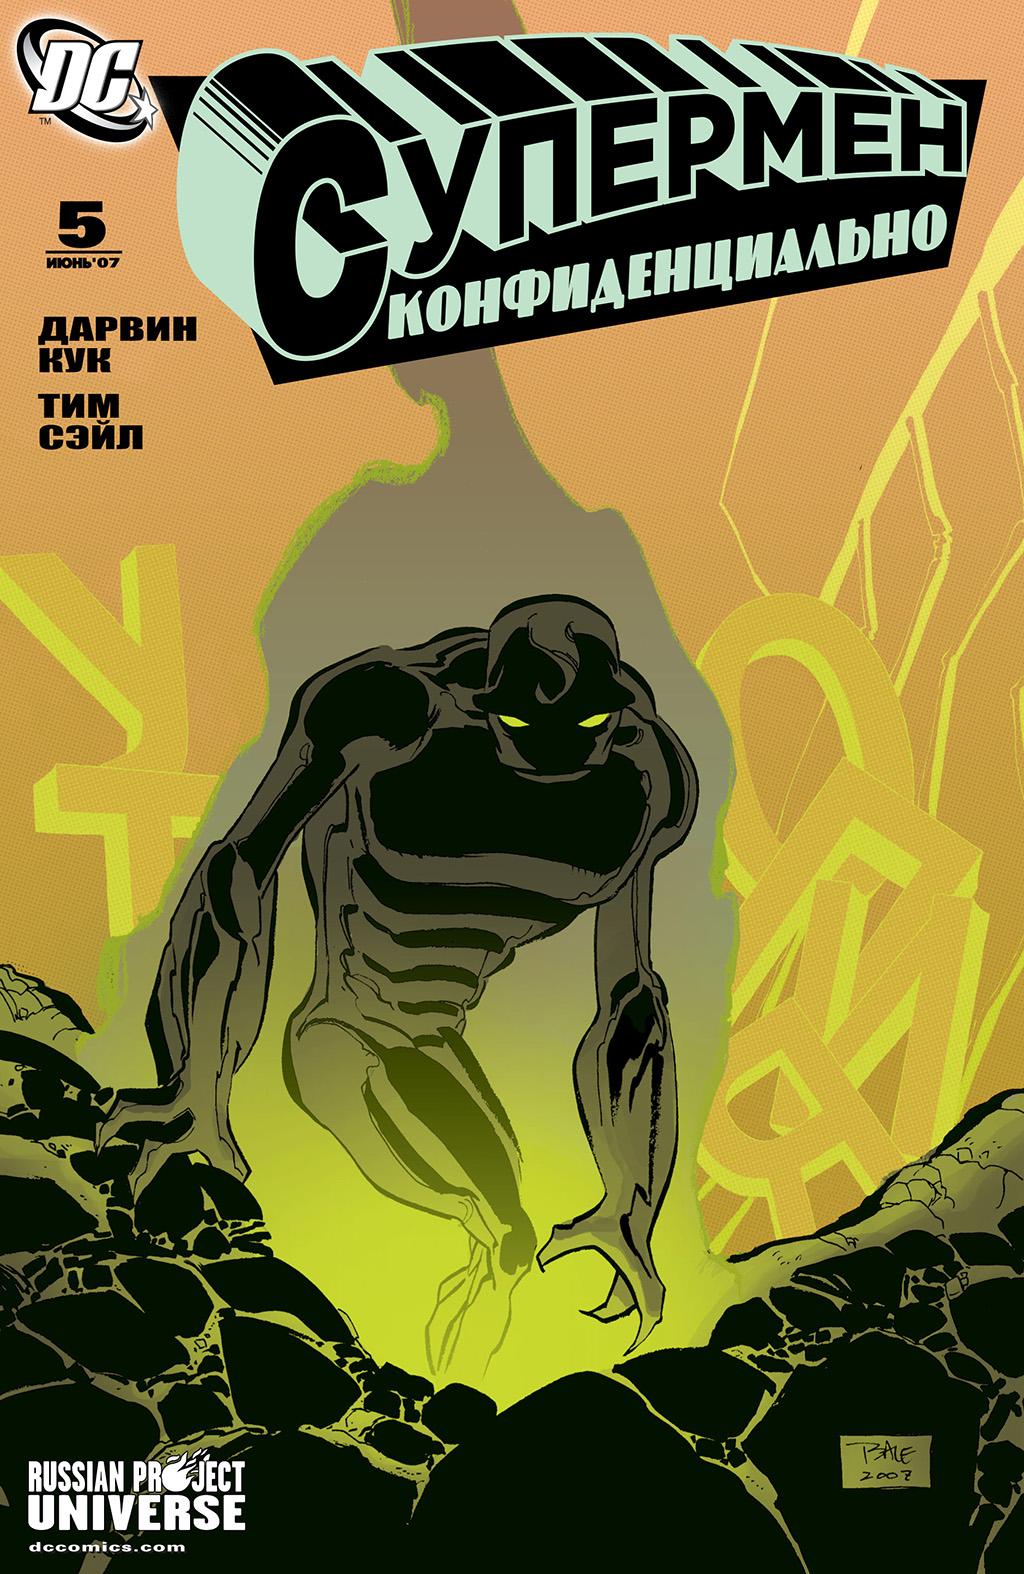 Комикс Супермен - Конфиденциально